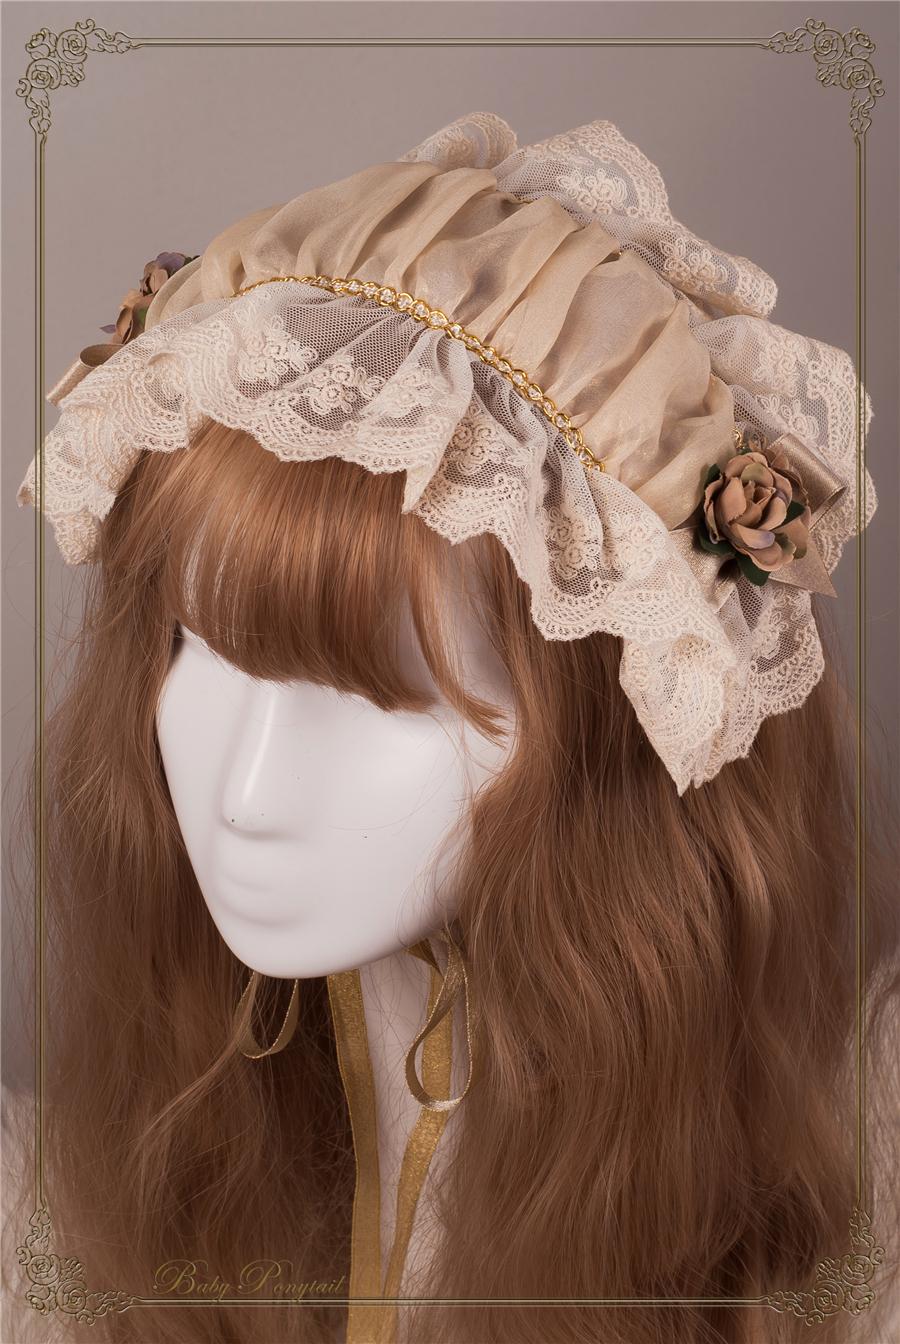 BabyPonytail_Rose Battle_Stock Photo_Petite Rose Head Dress Amber_9.jpg